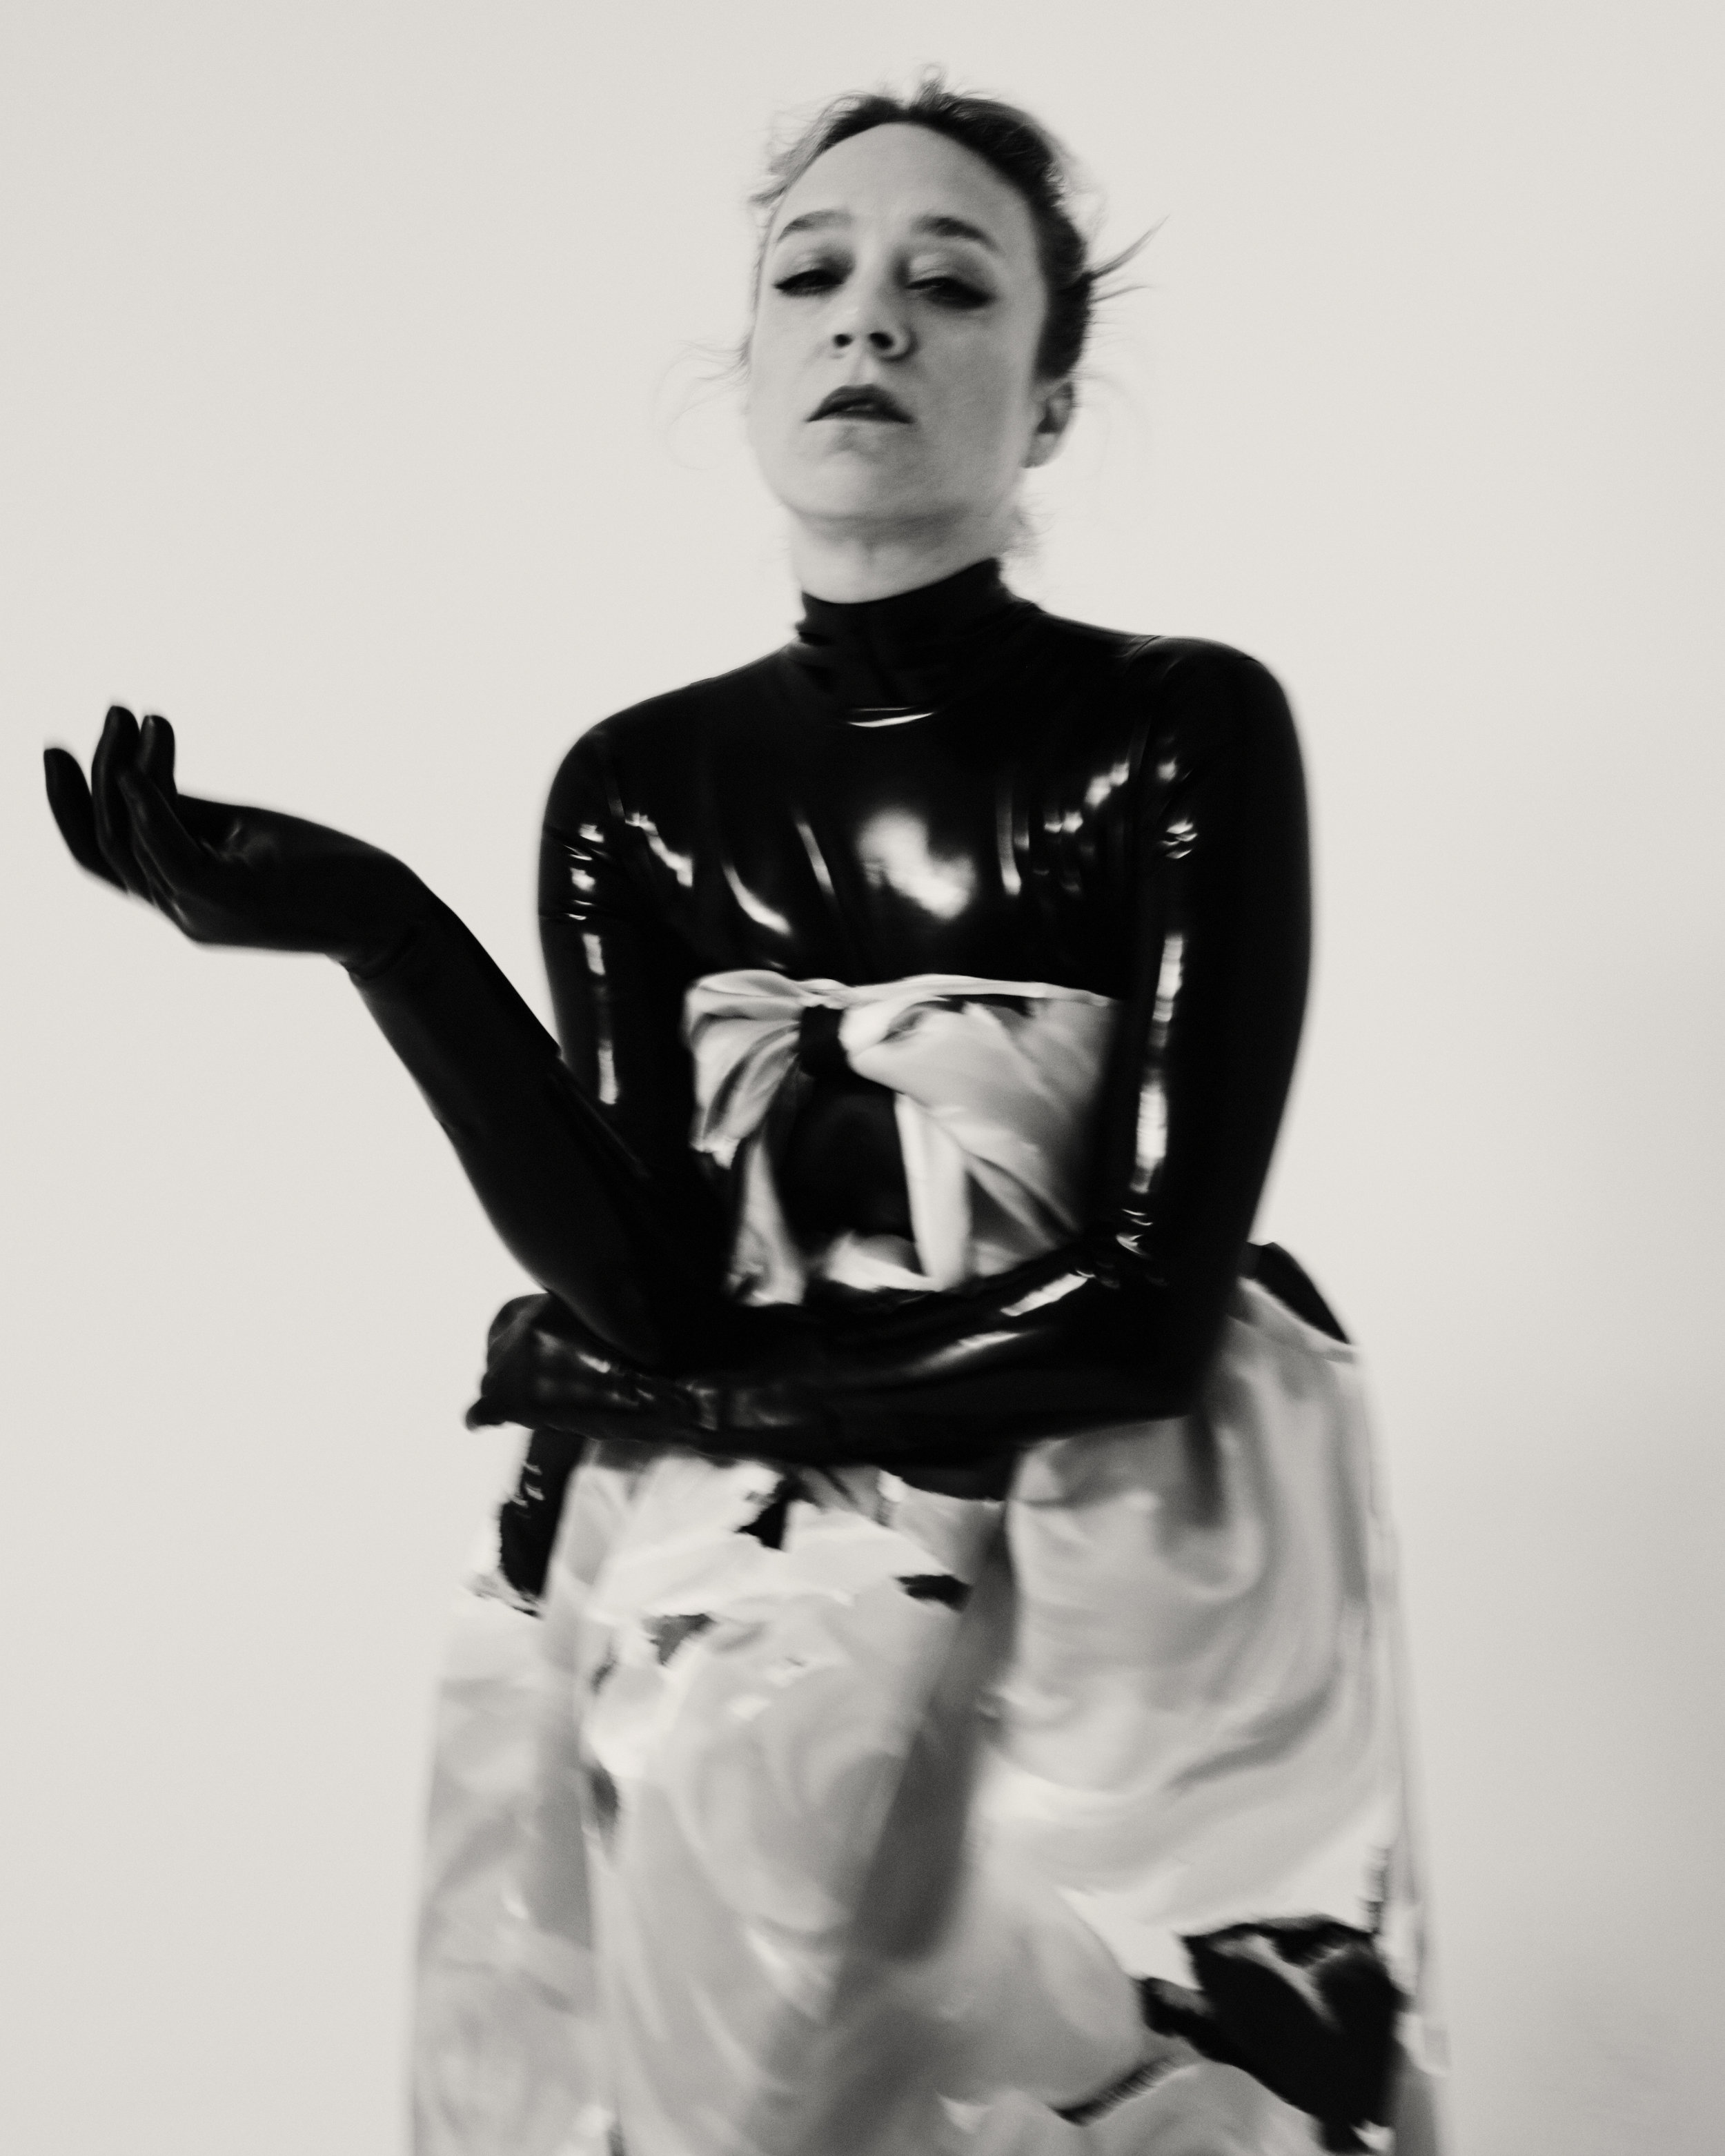 Chloë Sevigny for WWD by Katya Foreman, Styled by Alex Badia